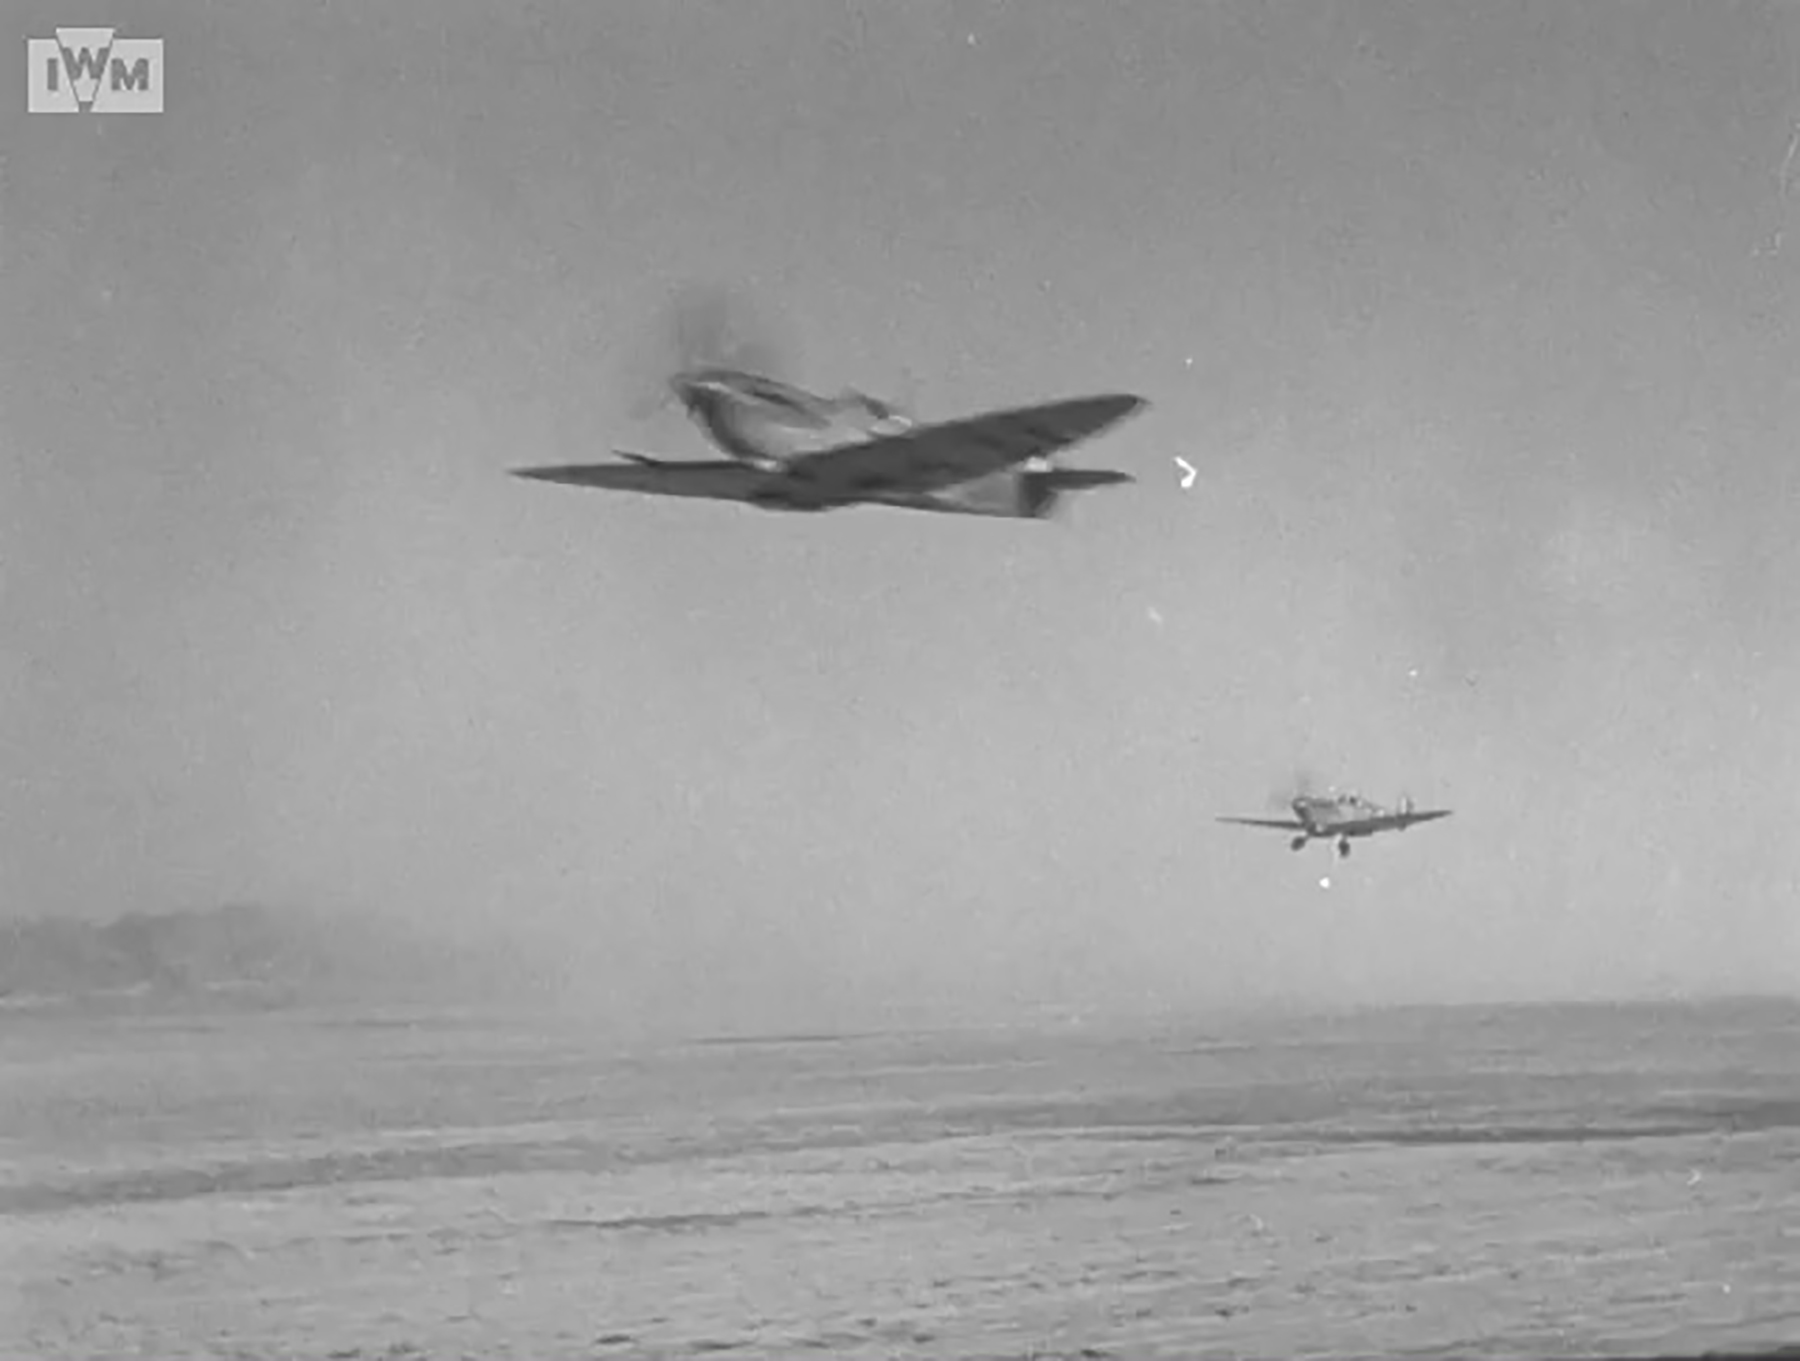 Spitfire VIII RAF 136Sqn in line abreast formation taking off from Rumkhapalong Bangladesh CBI 1944 IWM 02